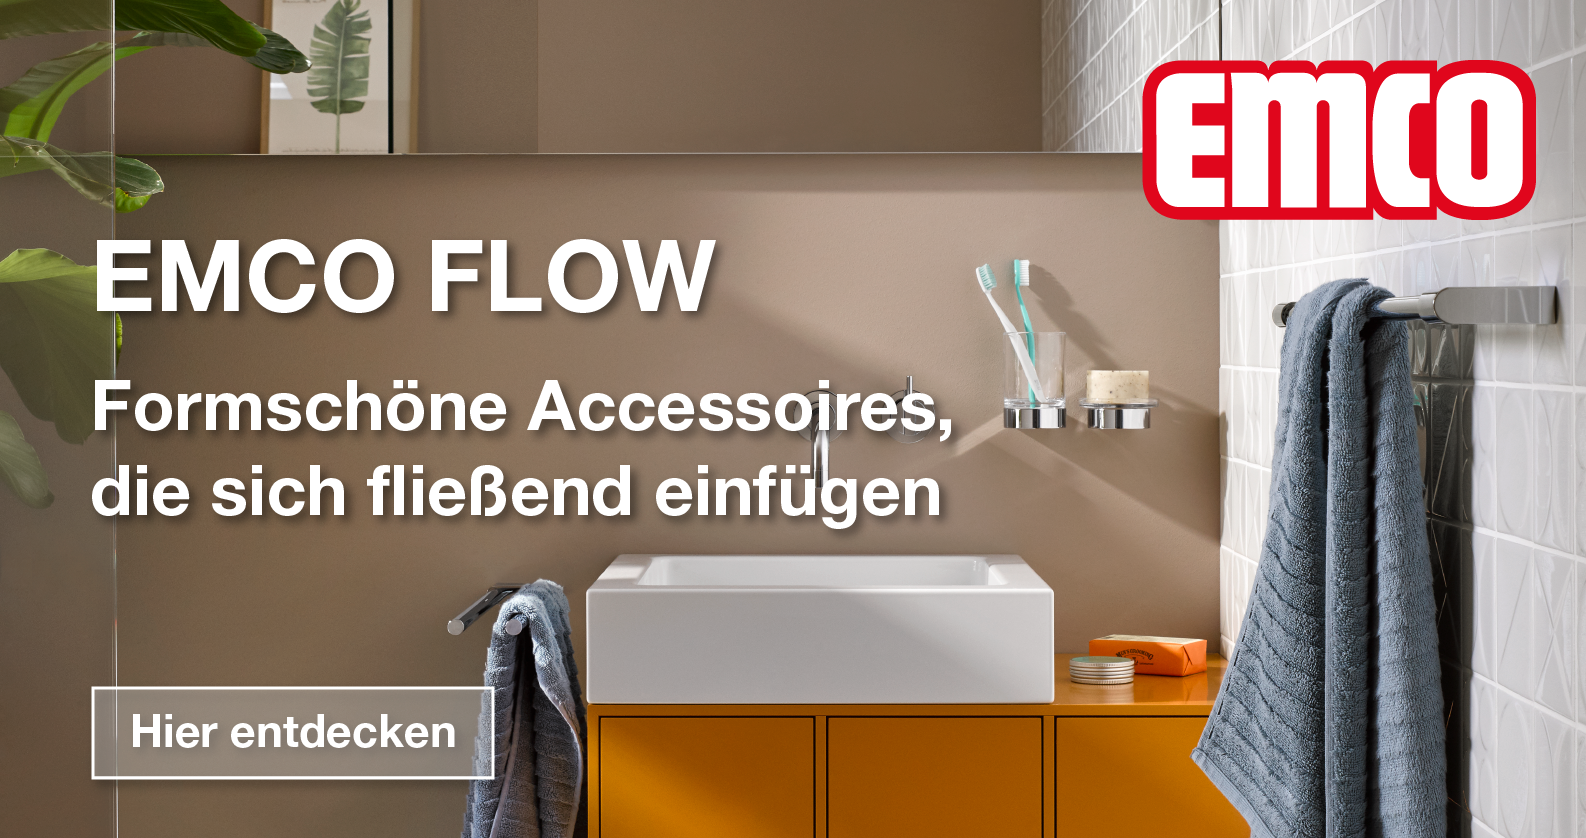 EMCO Flow Accessoires bei xTWOstore entdecken